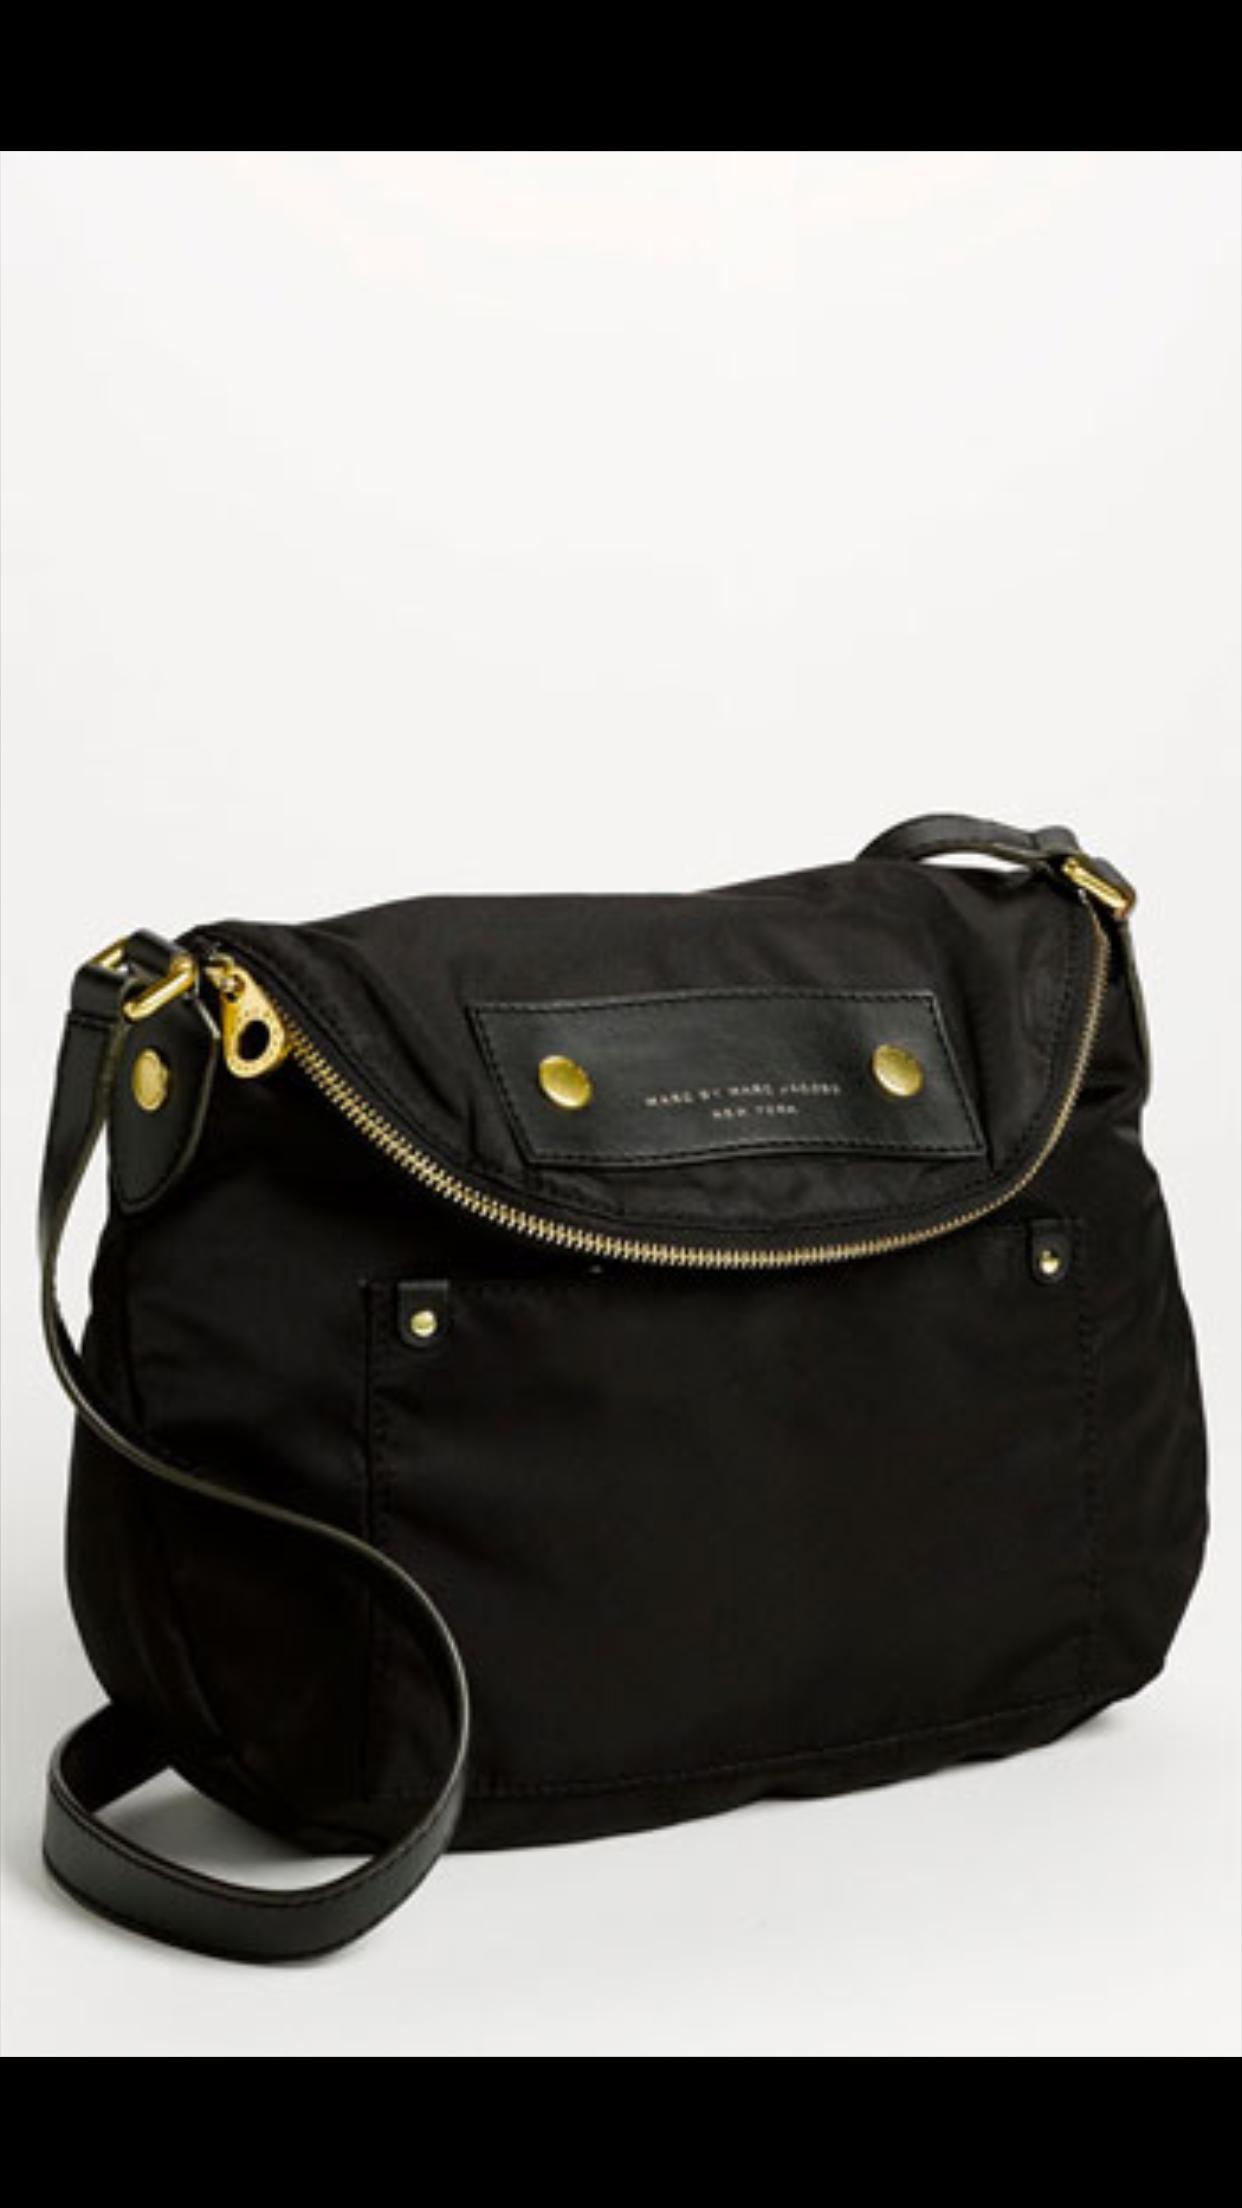 c50f39cd3e10 Marc by Marc Jacobs Preppy Nylon Sasha Cross Body Bag   285